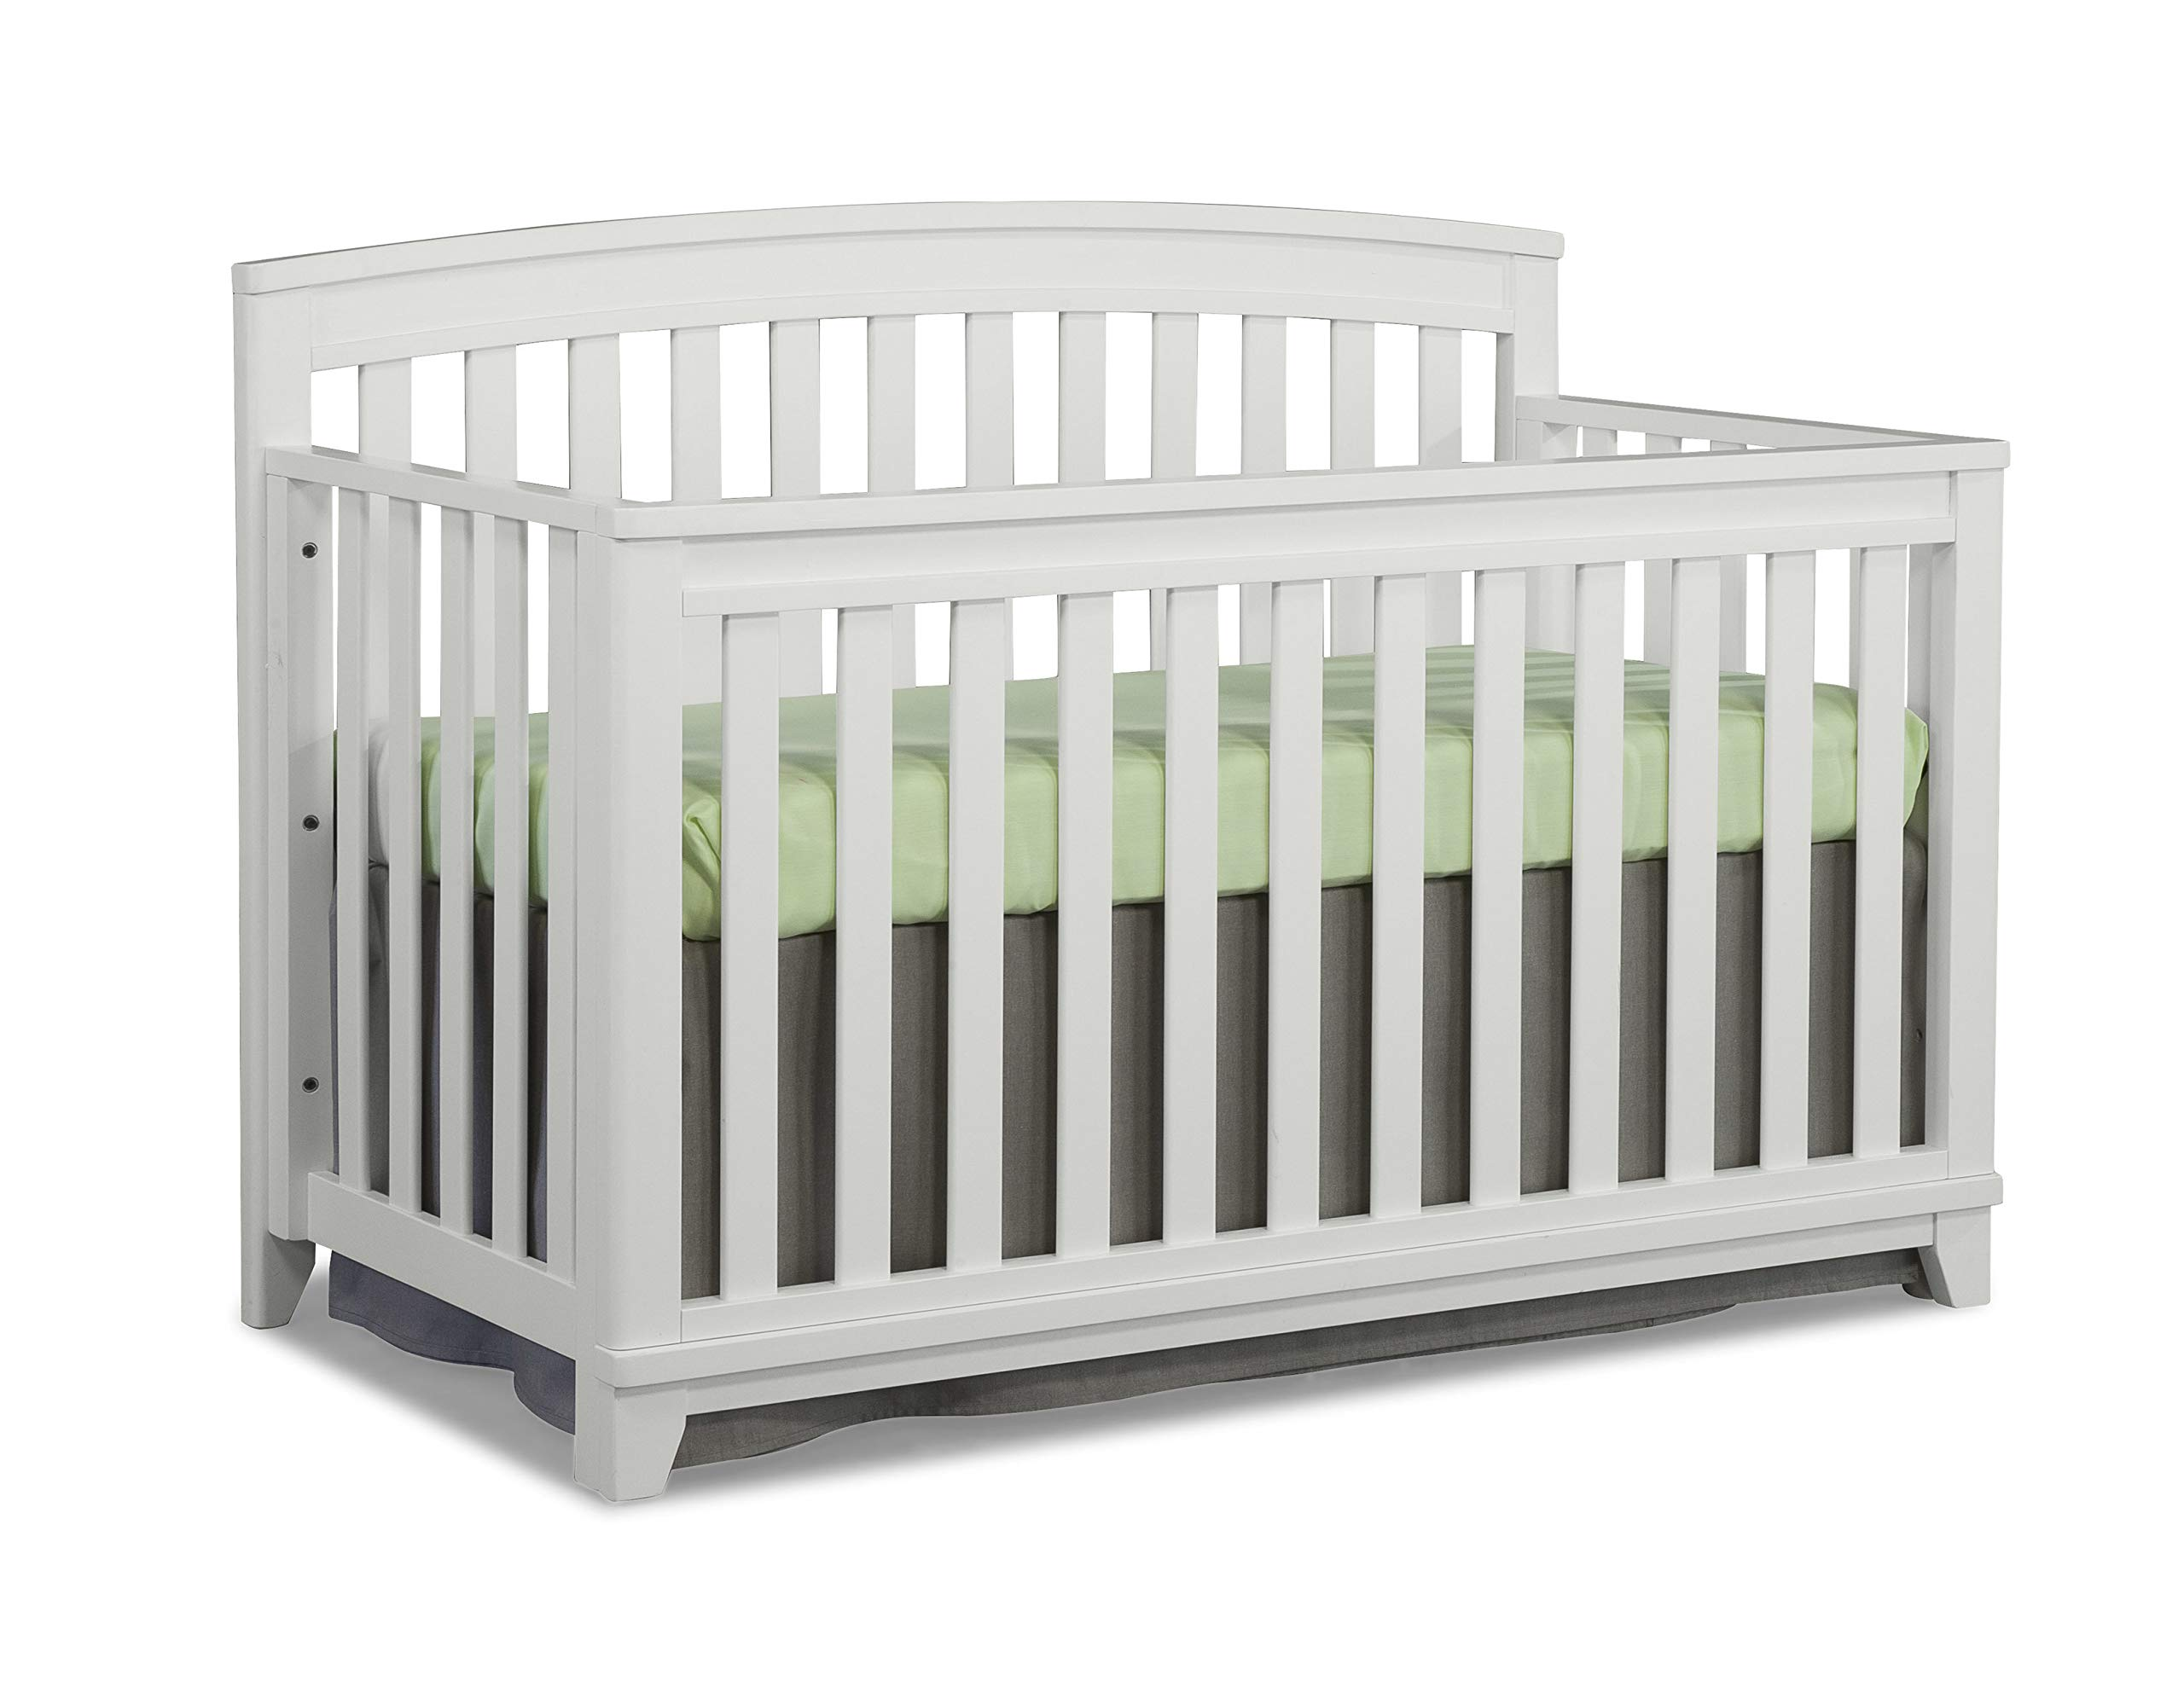 Full Size Conversion Kit Bed Rails for Westwood Design Adelle, Jonesport, Midtown (Imagio Baby) Pine Ridge, Stone Harbor & Wyatt Cribs (White) by CC KITS